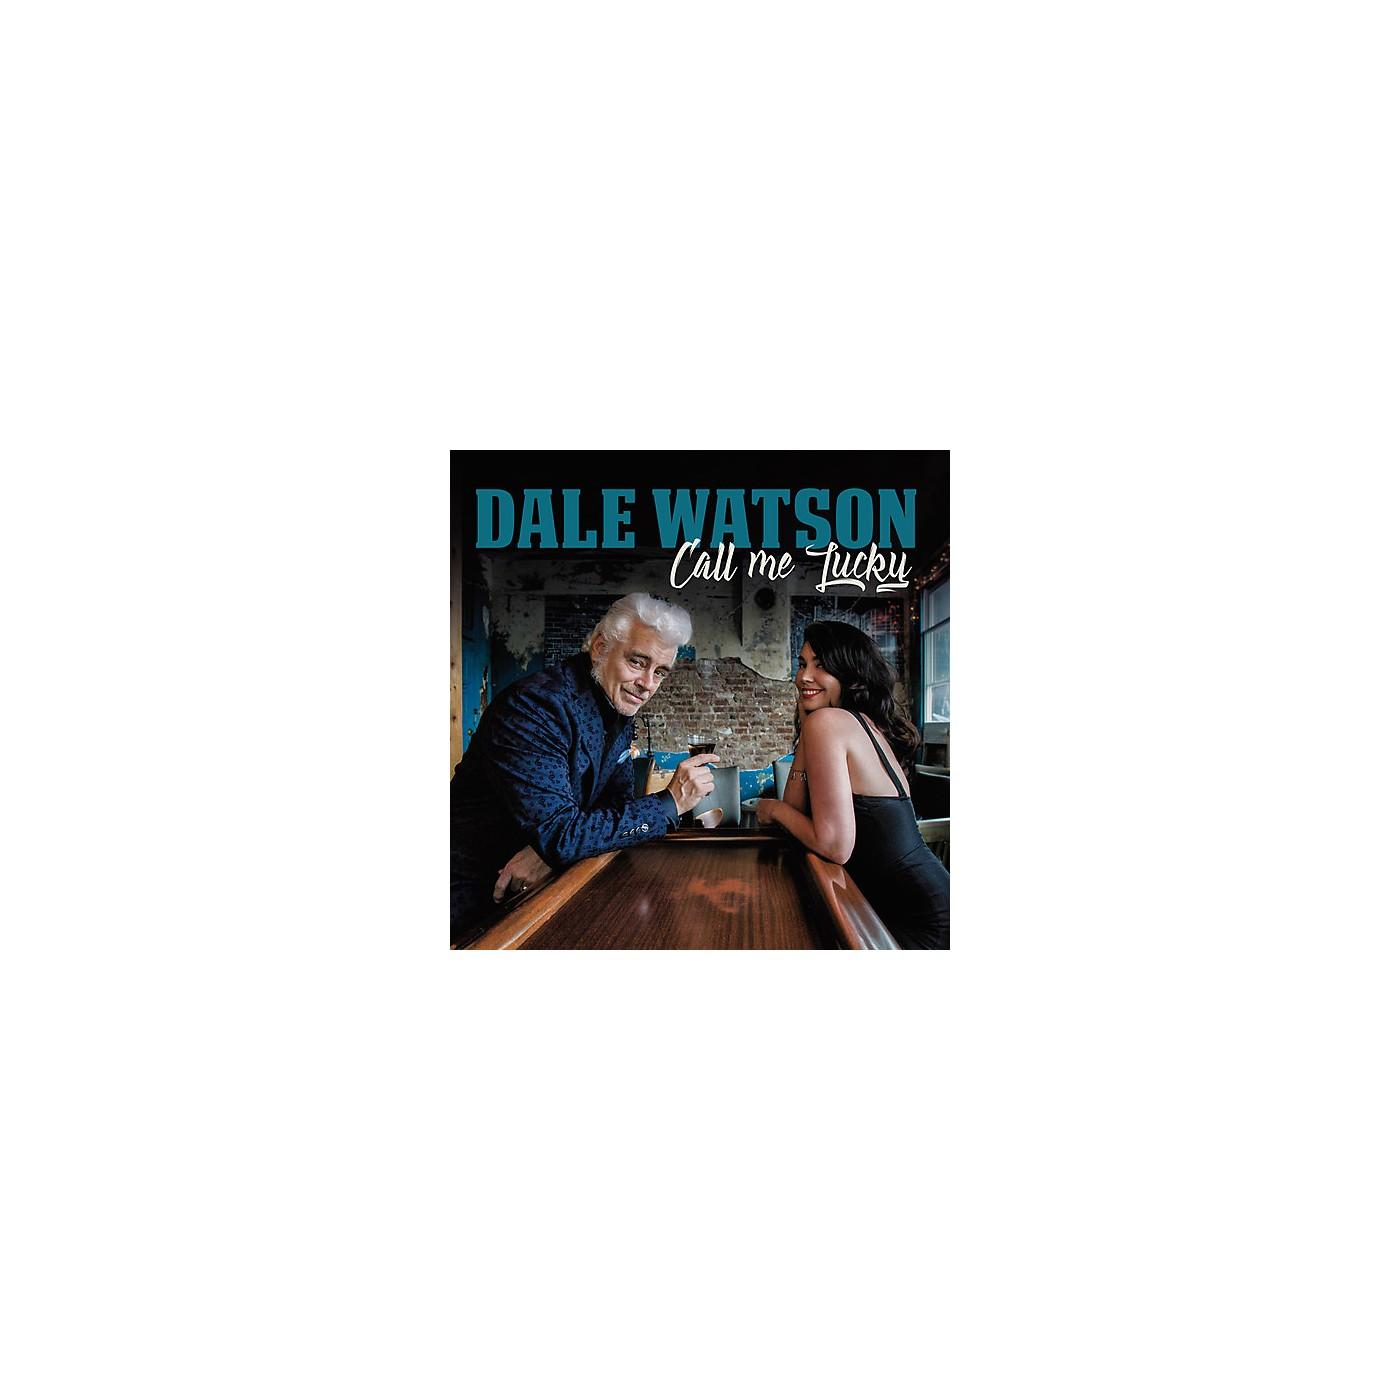 Alliance Dale Watson - Call Me Lucky (CD) thumbnail